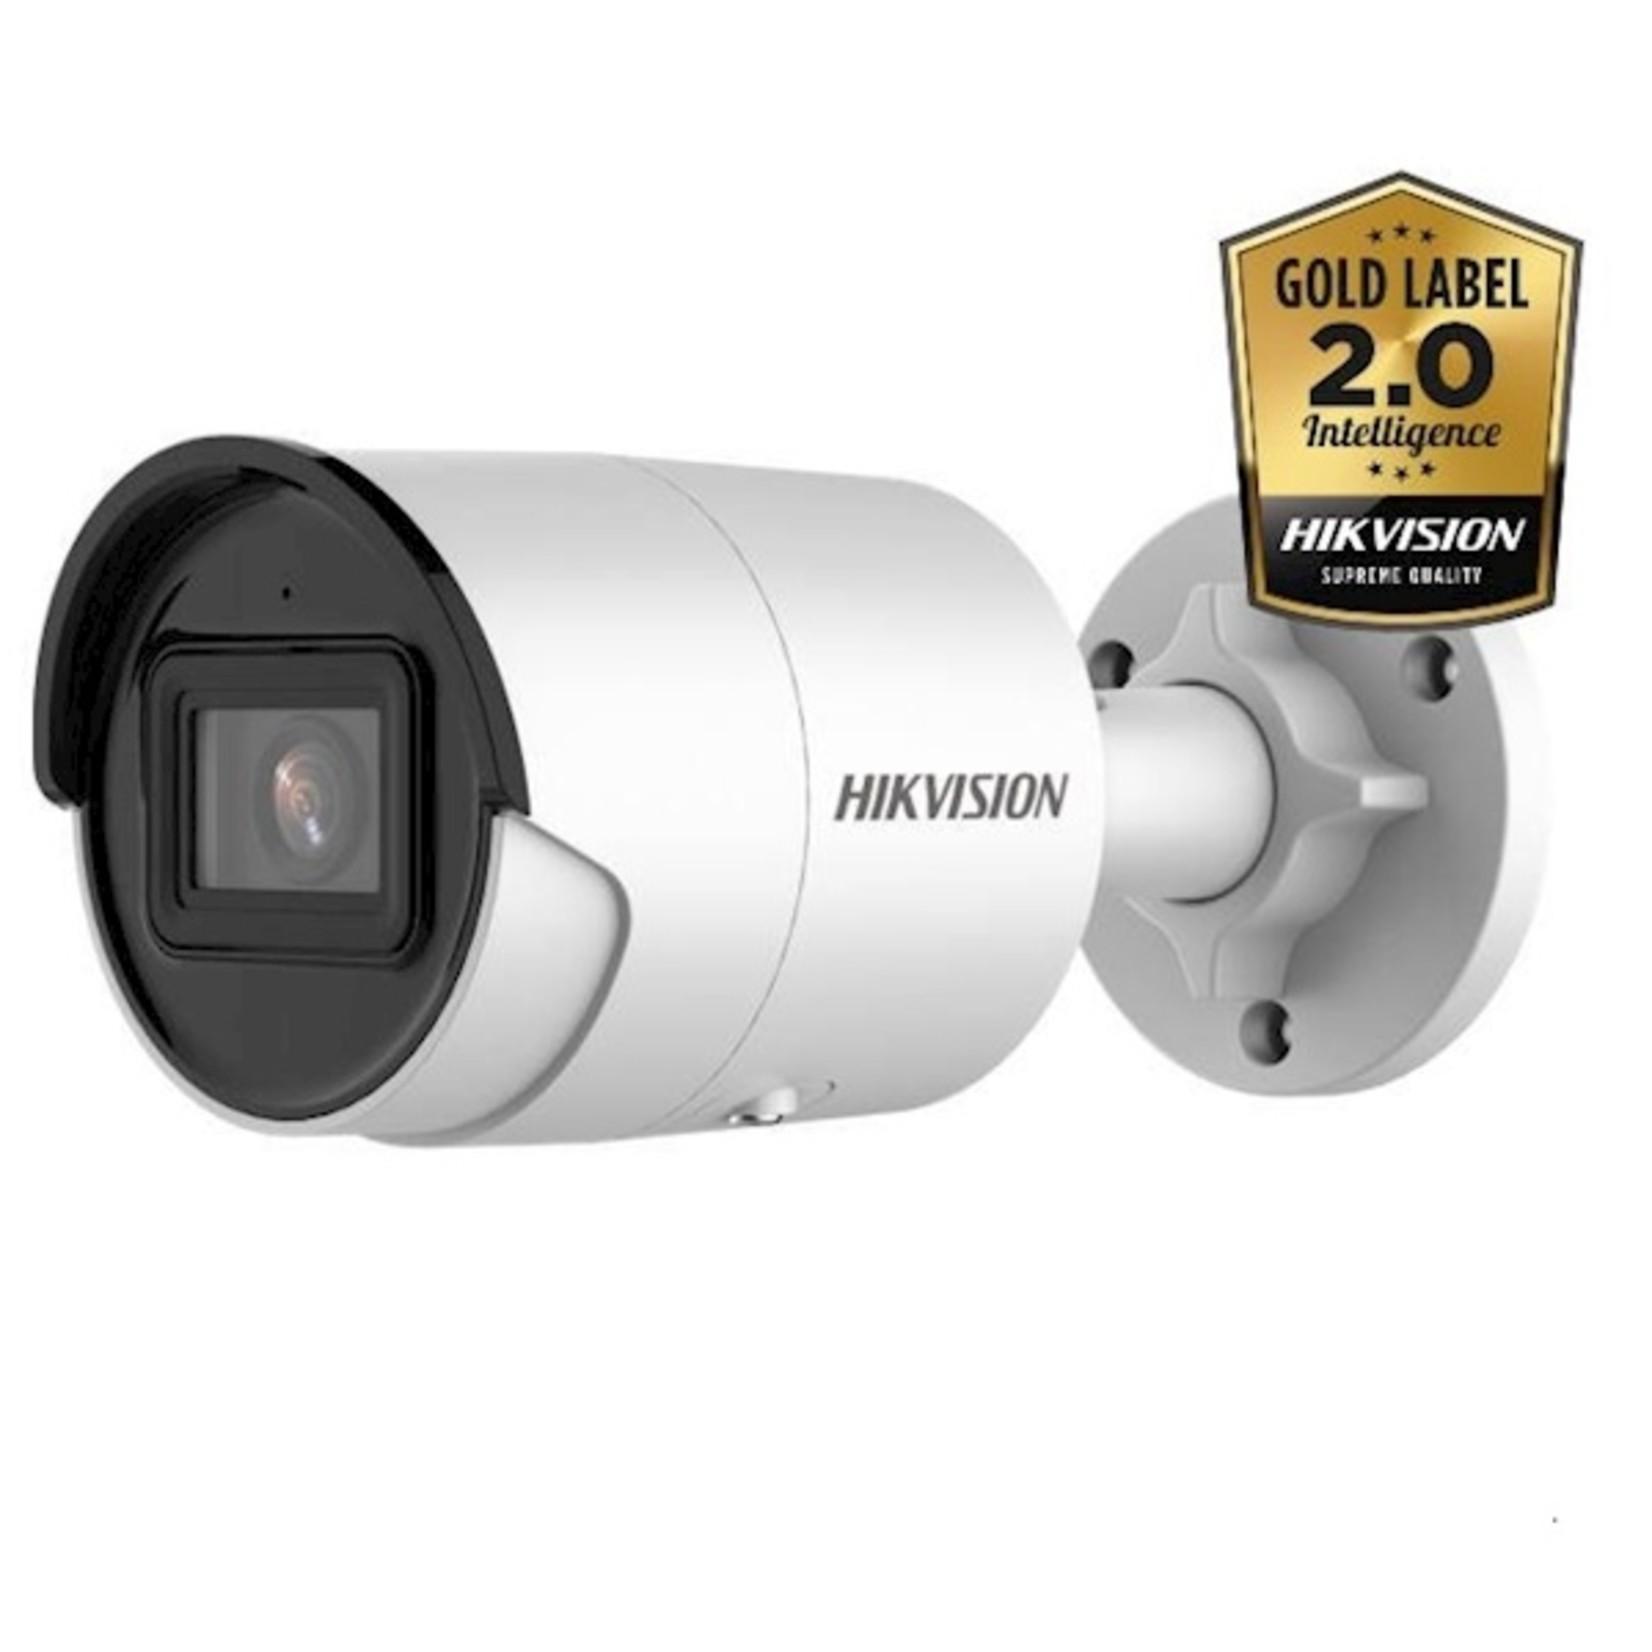 Hikvision DS-2CD2026G2-I, 2MP, 40m IR, WDR